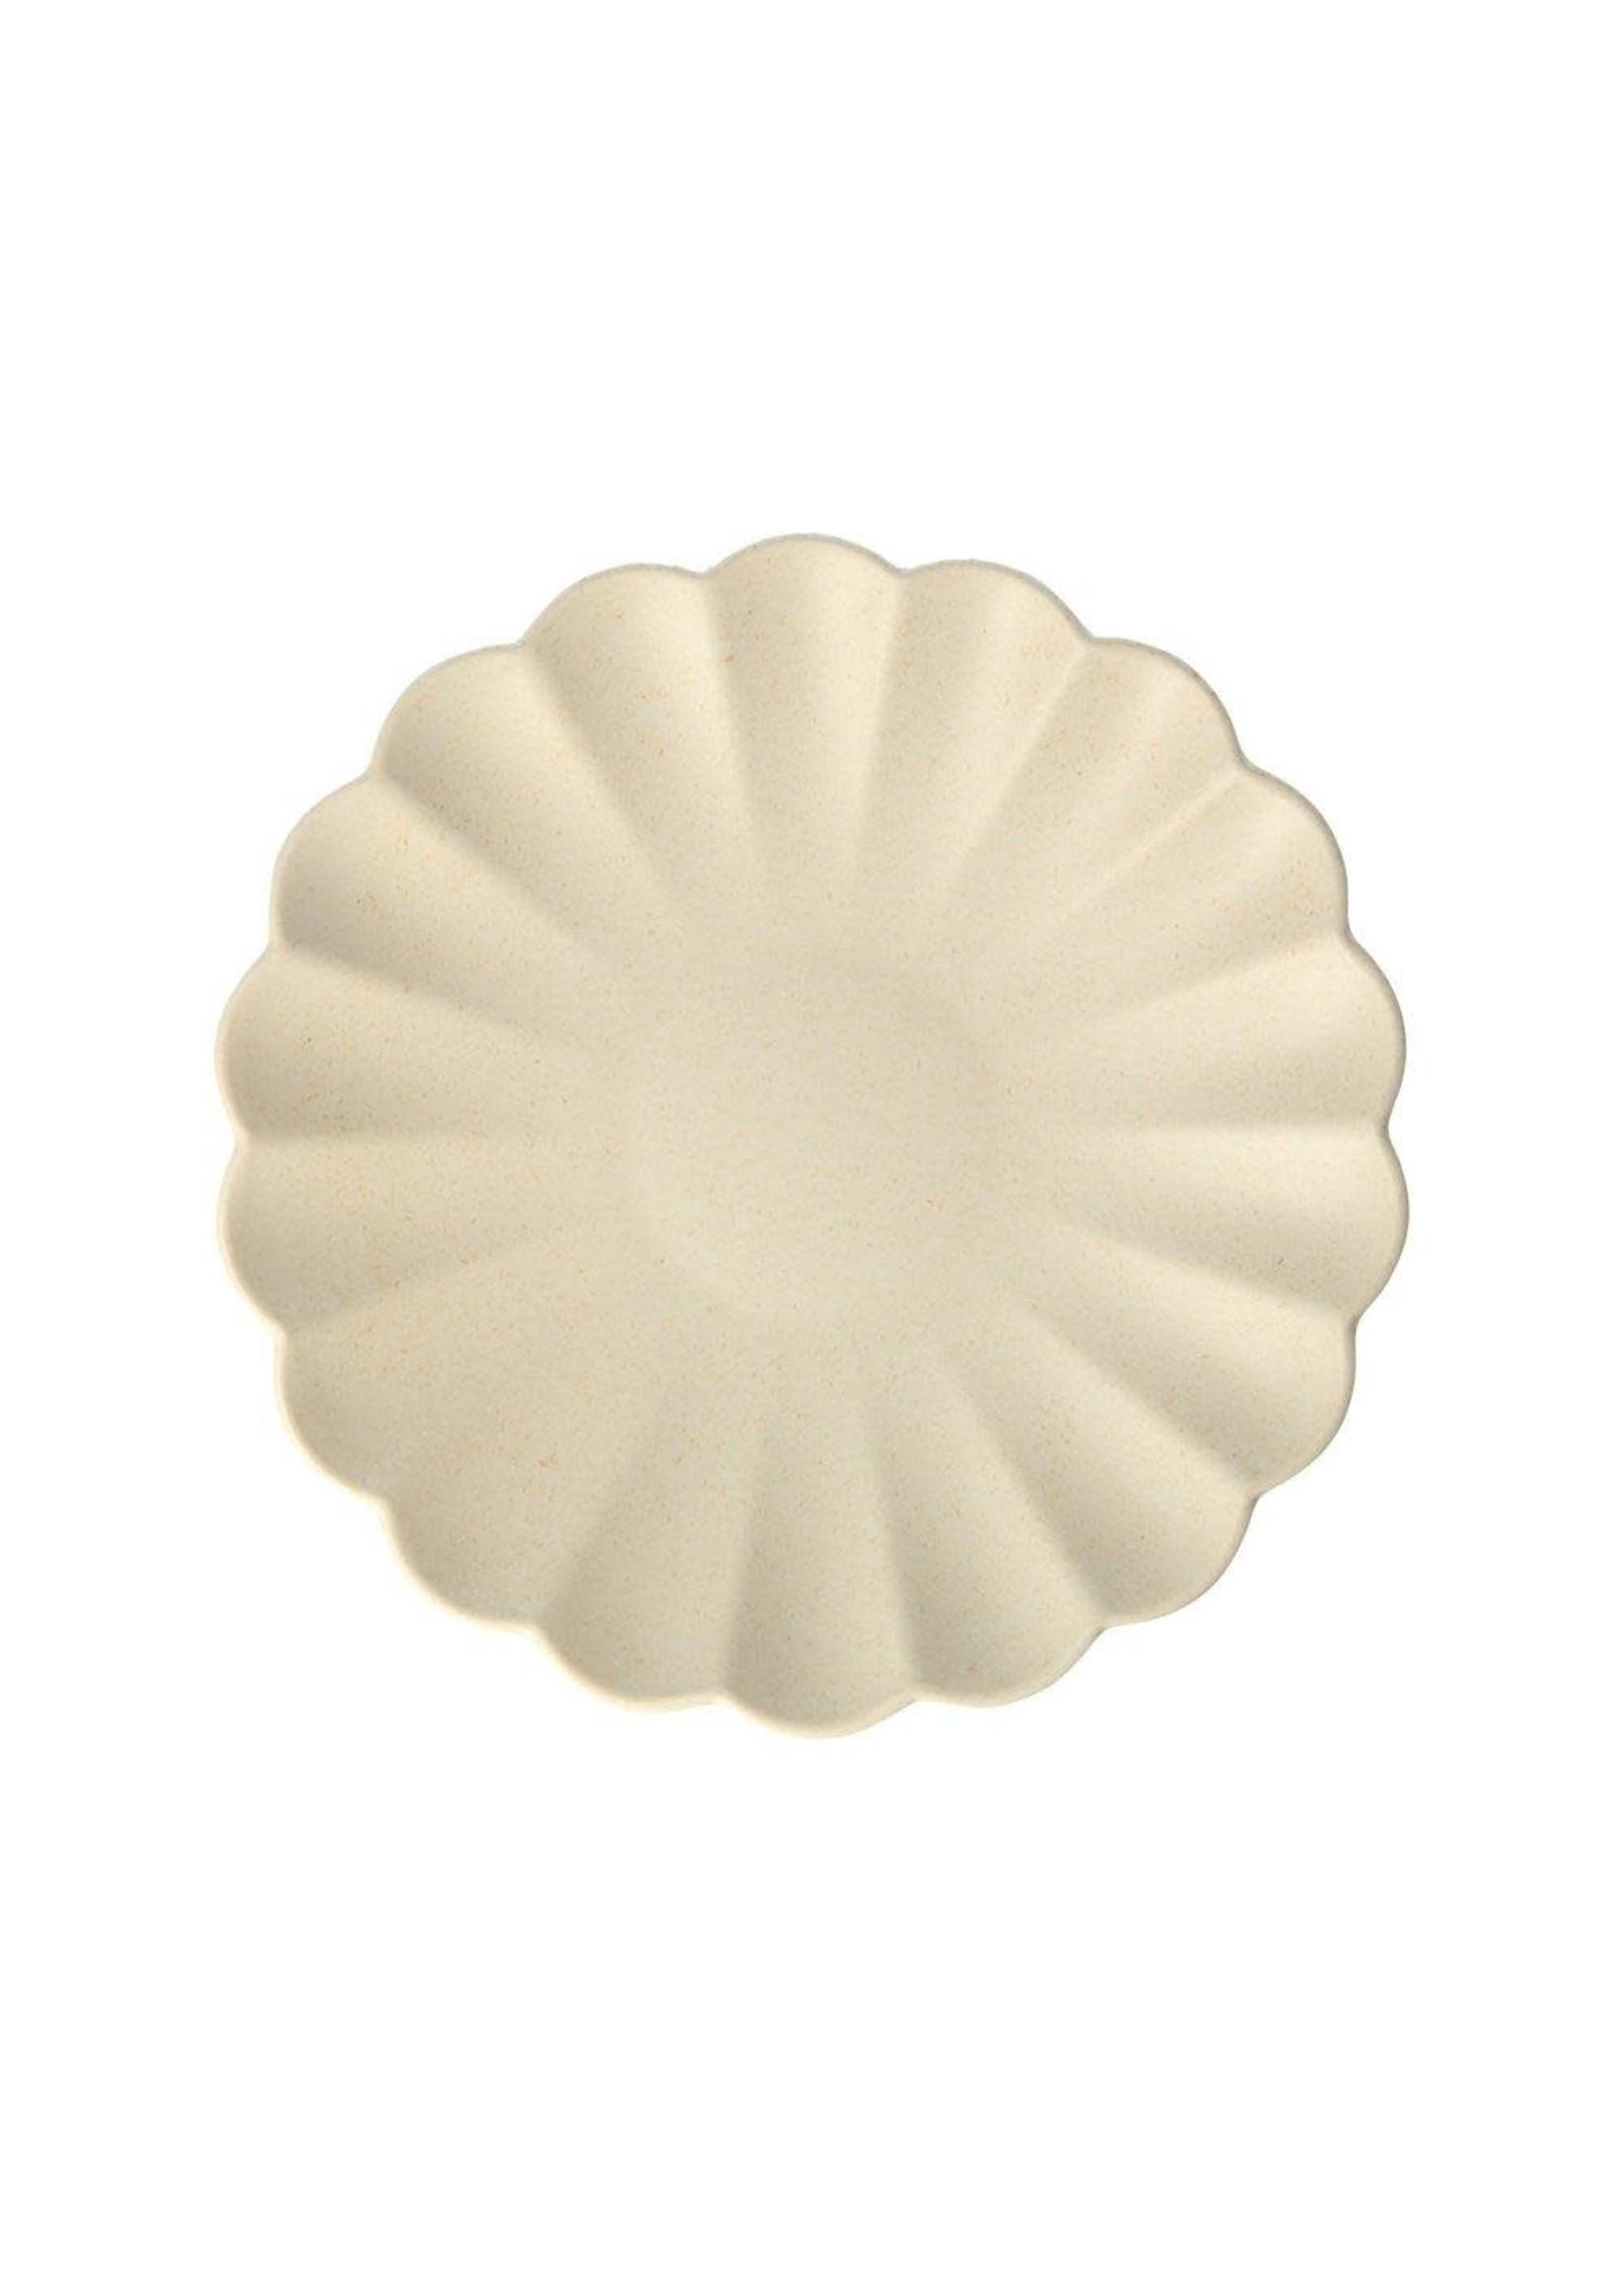 Meri Meri Bamboo Plates - Natural Small